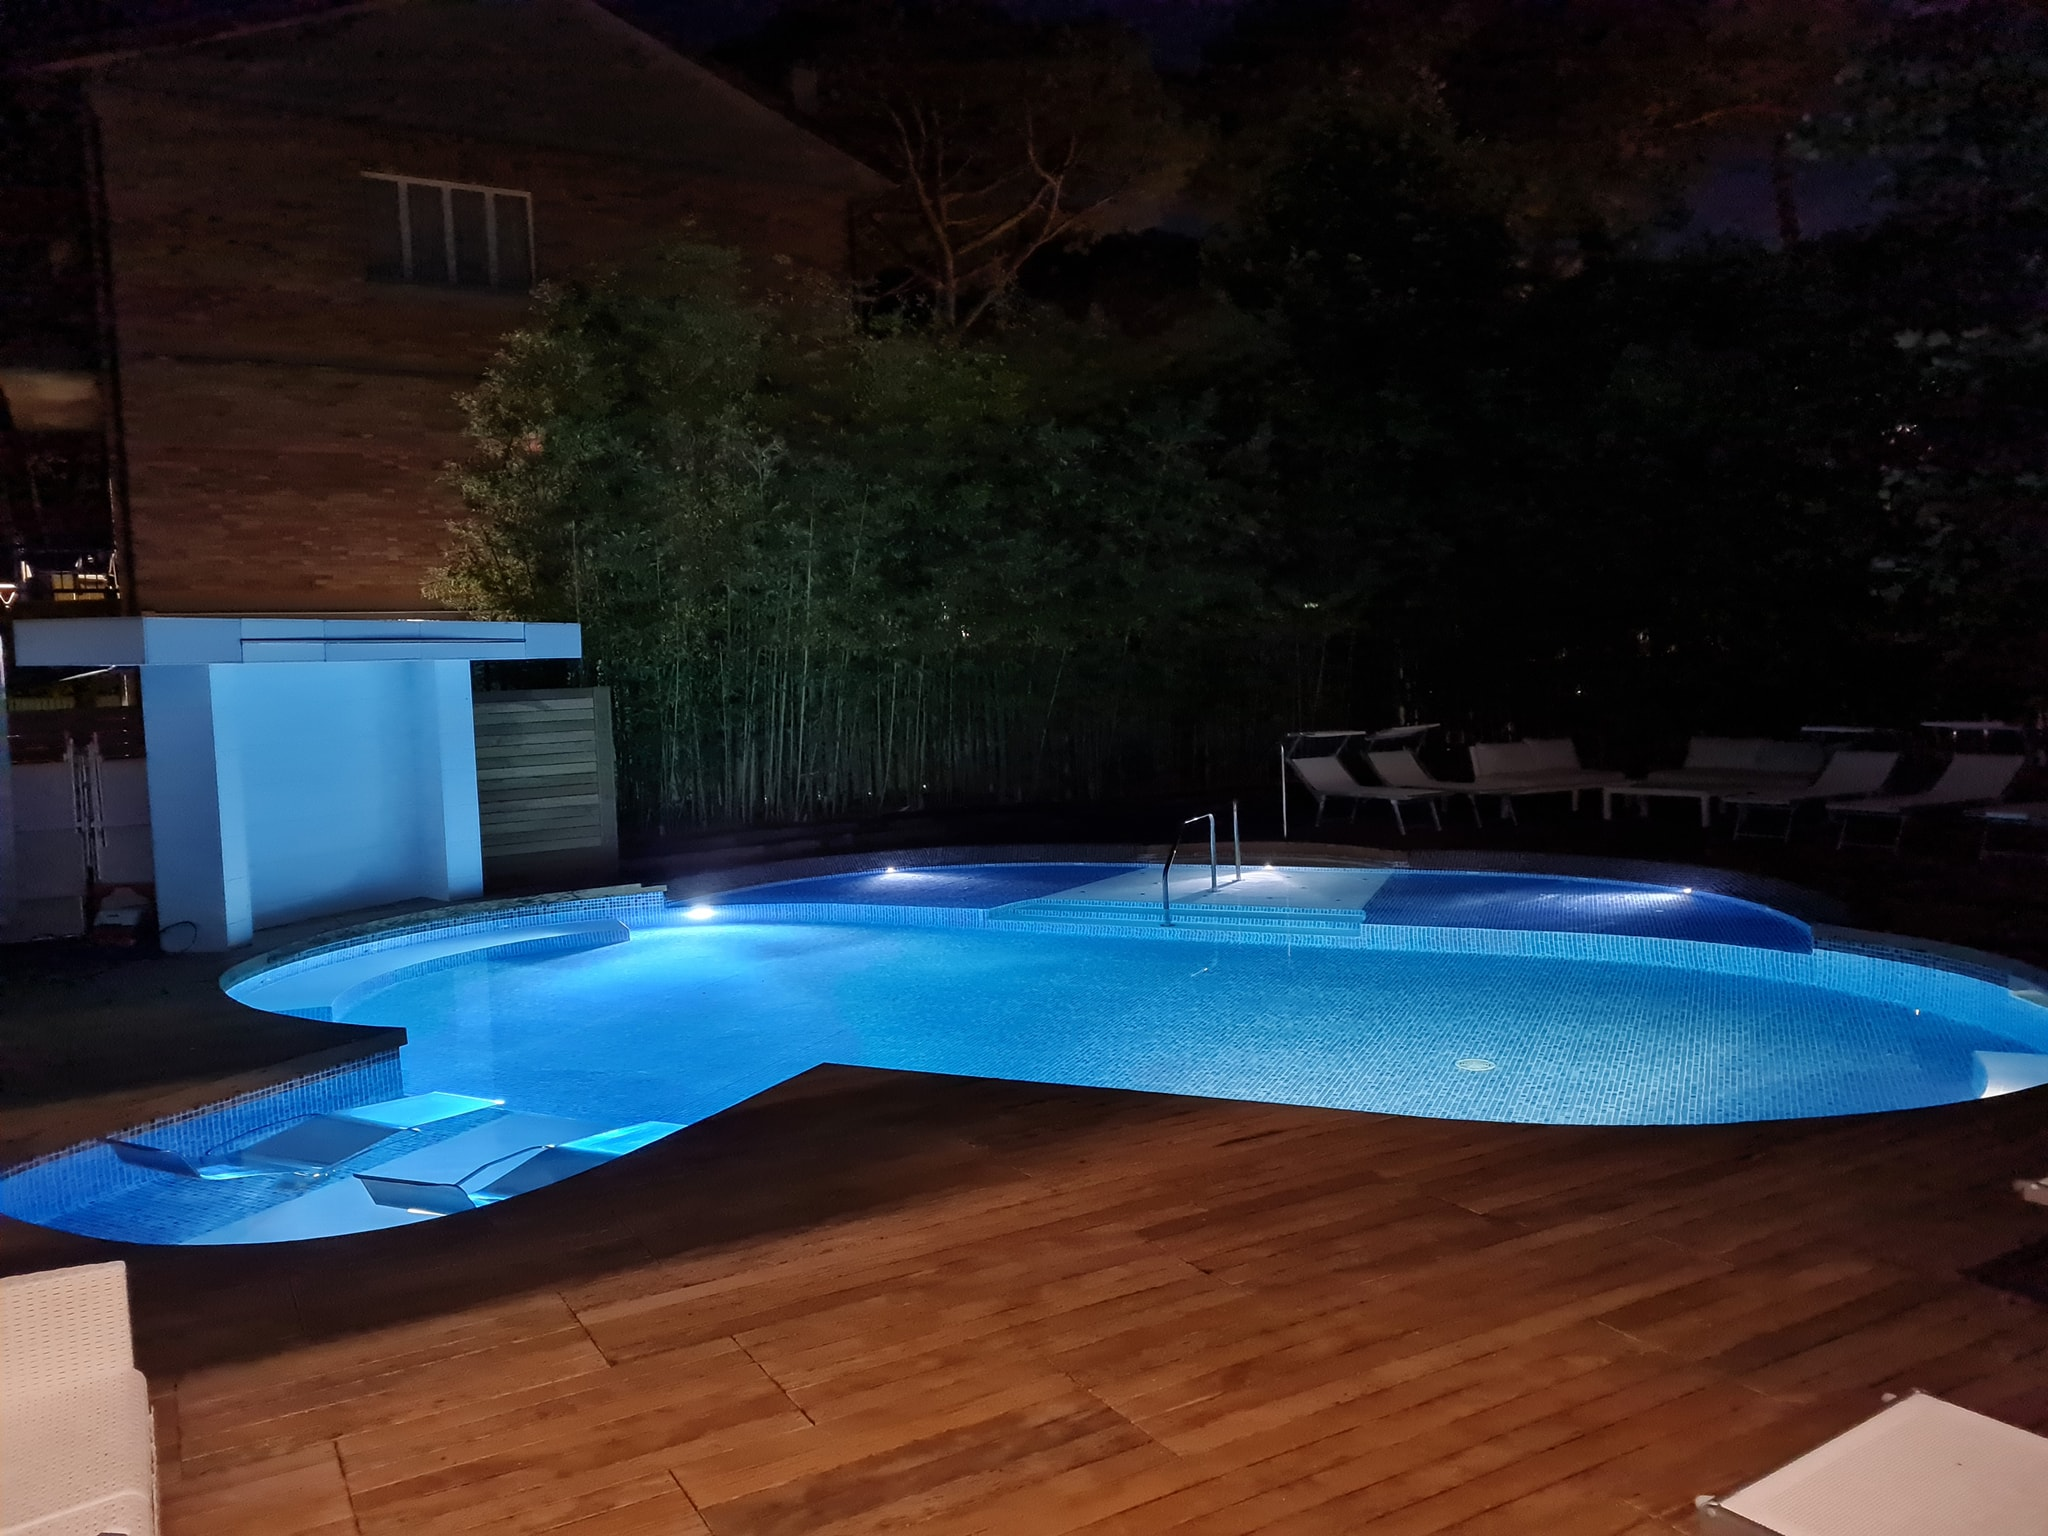 hotel saraceno milano marittima piscina riscaldata notturna